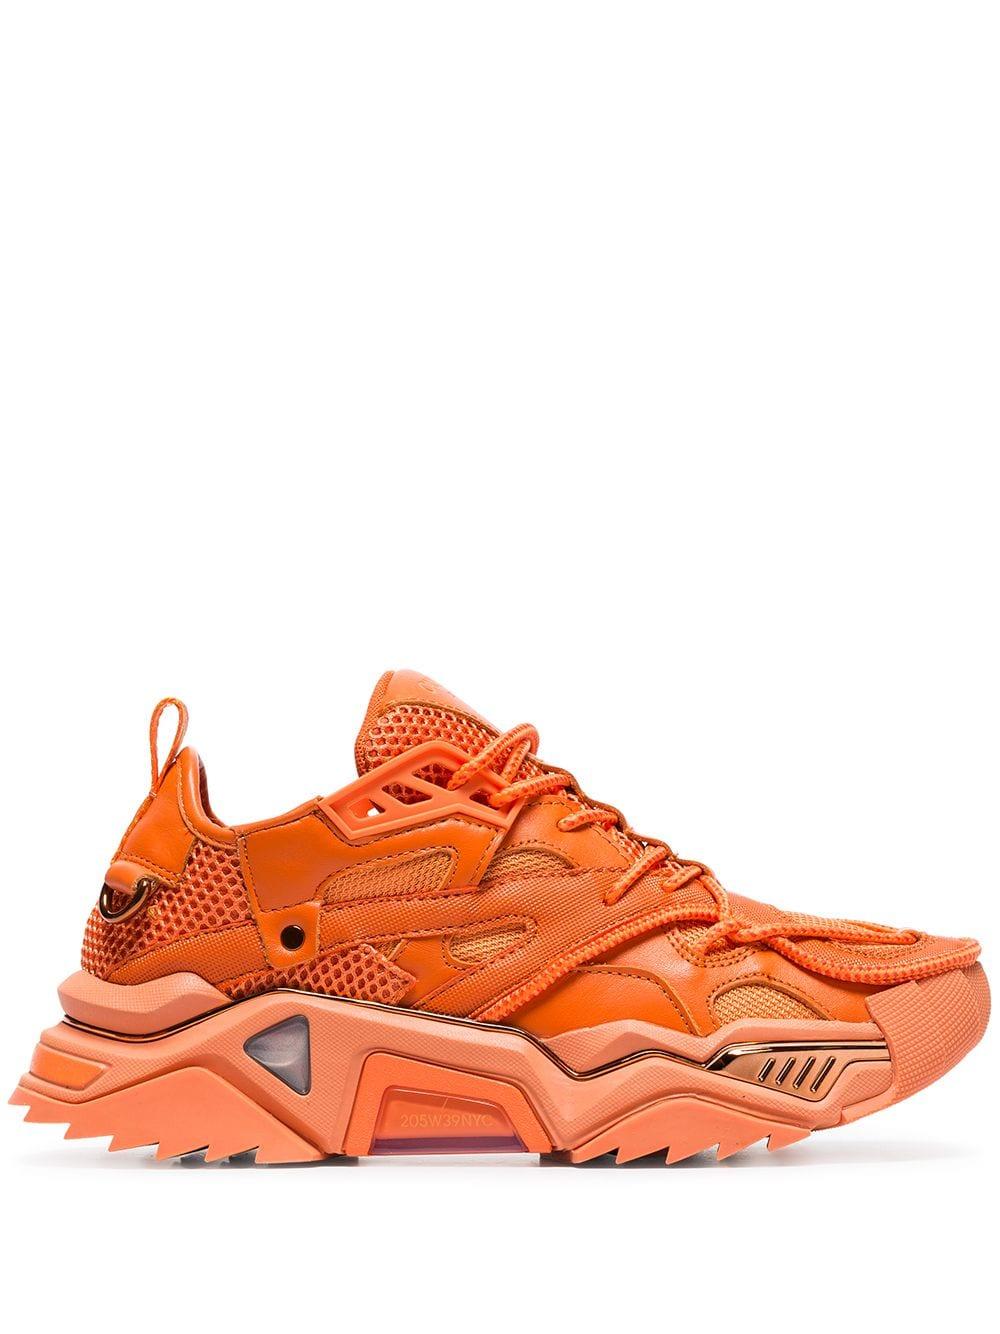 Leather Sneakers - Farfetch